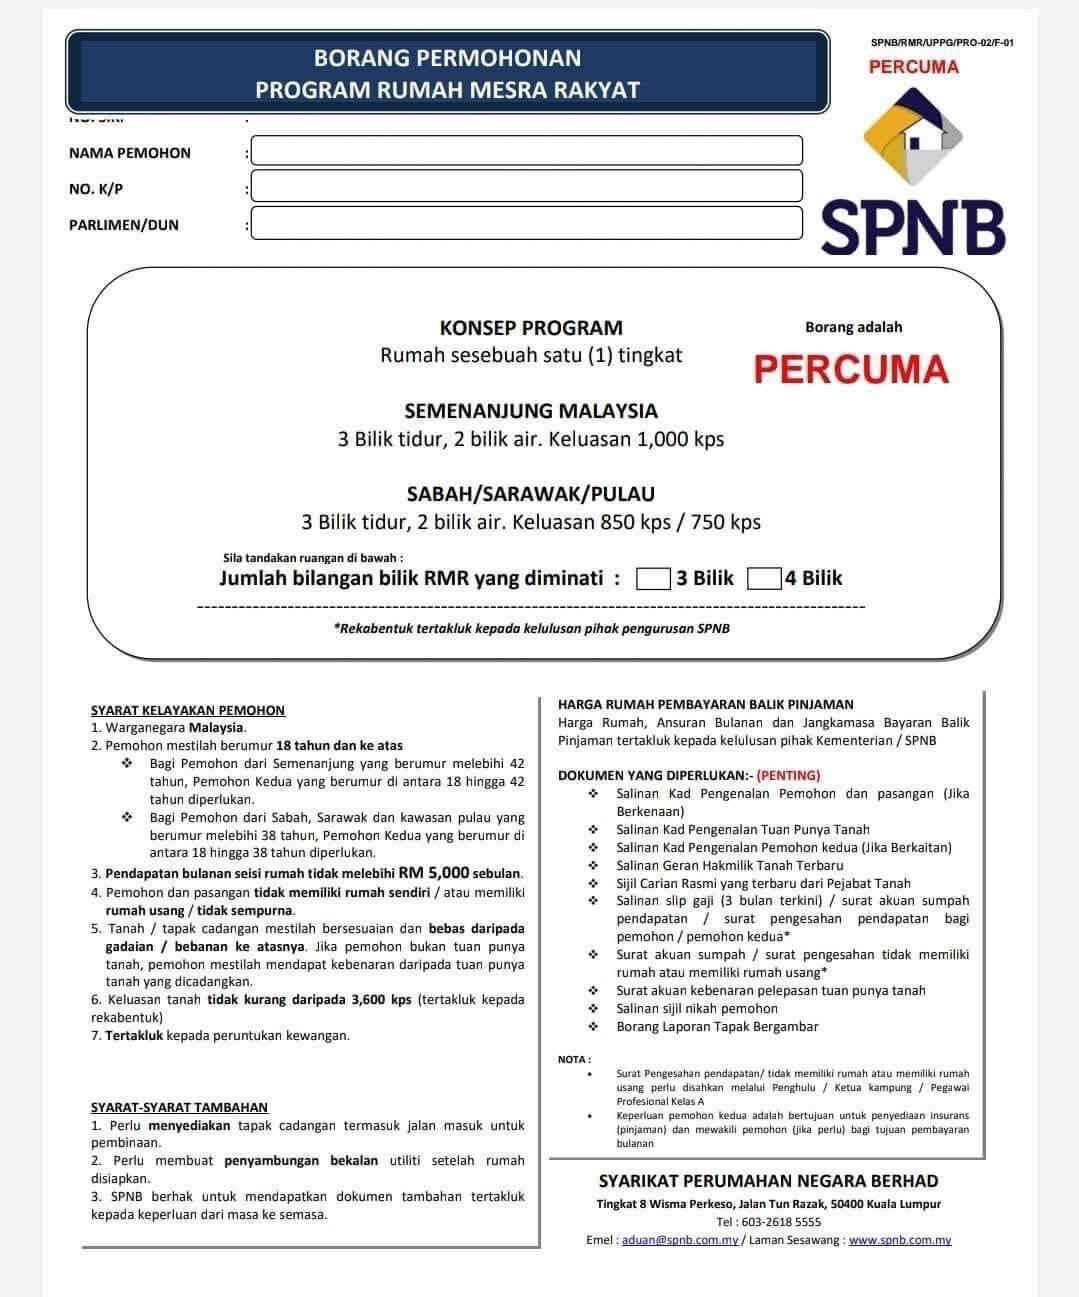 borang permohonan SPNB